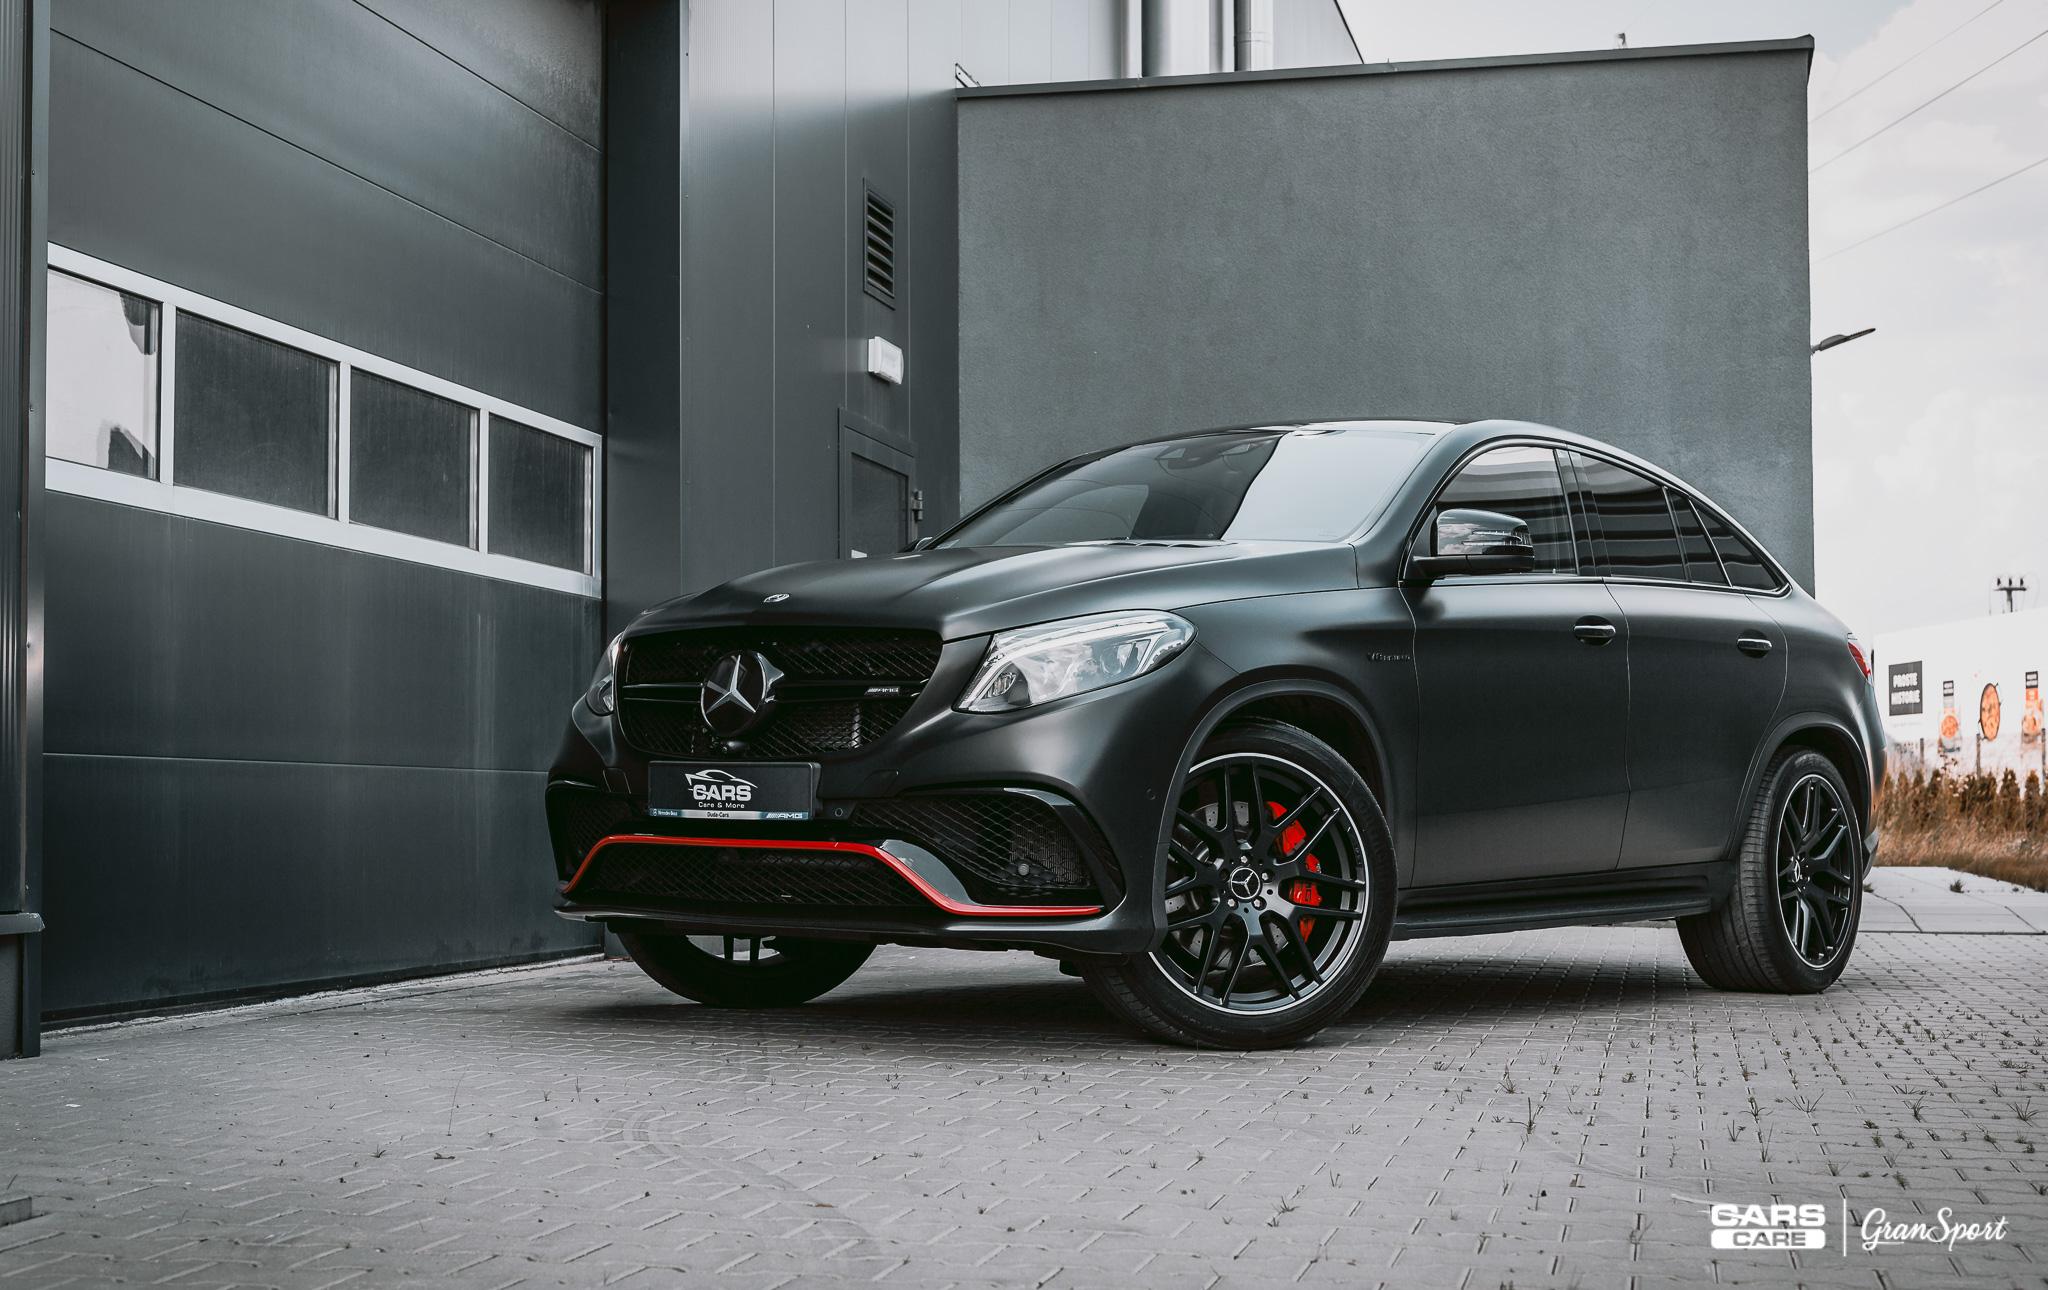 Mercedes-Benz GLE 63 AMG S Coupe - autodetailing - carscare.pl